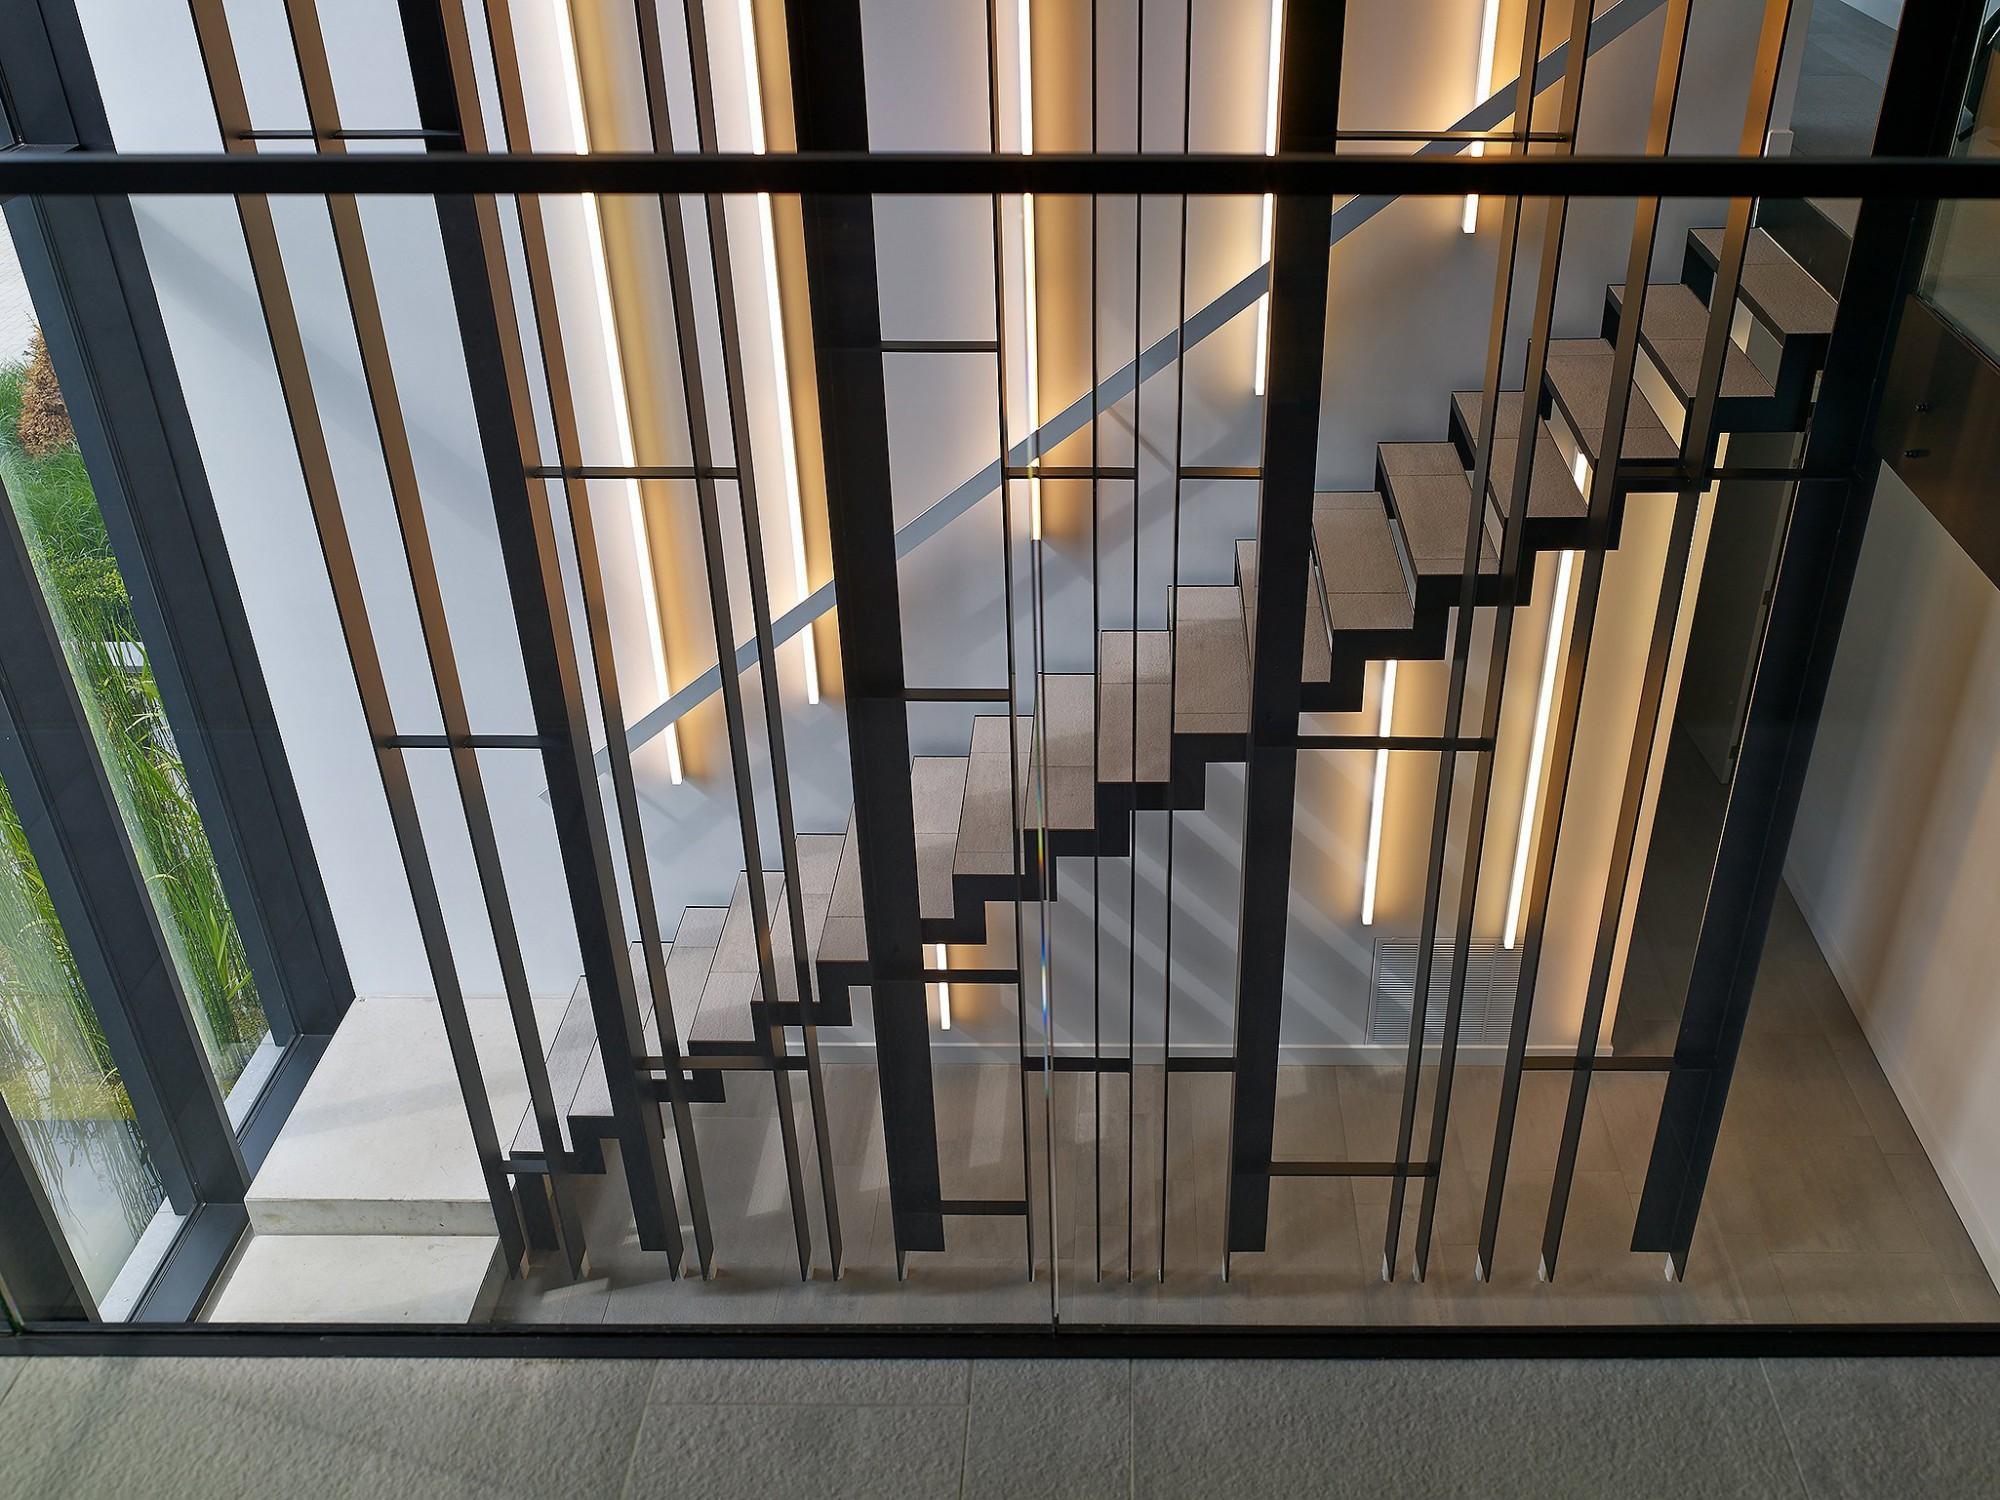 Afbeelding: Interieur fotografie inkom kantoor te Turnhout voor bouwonderneming Fransen.